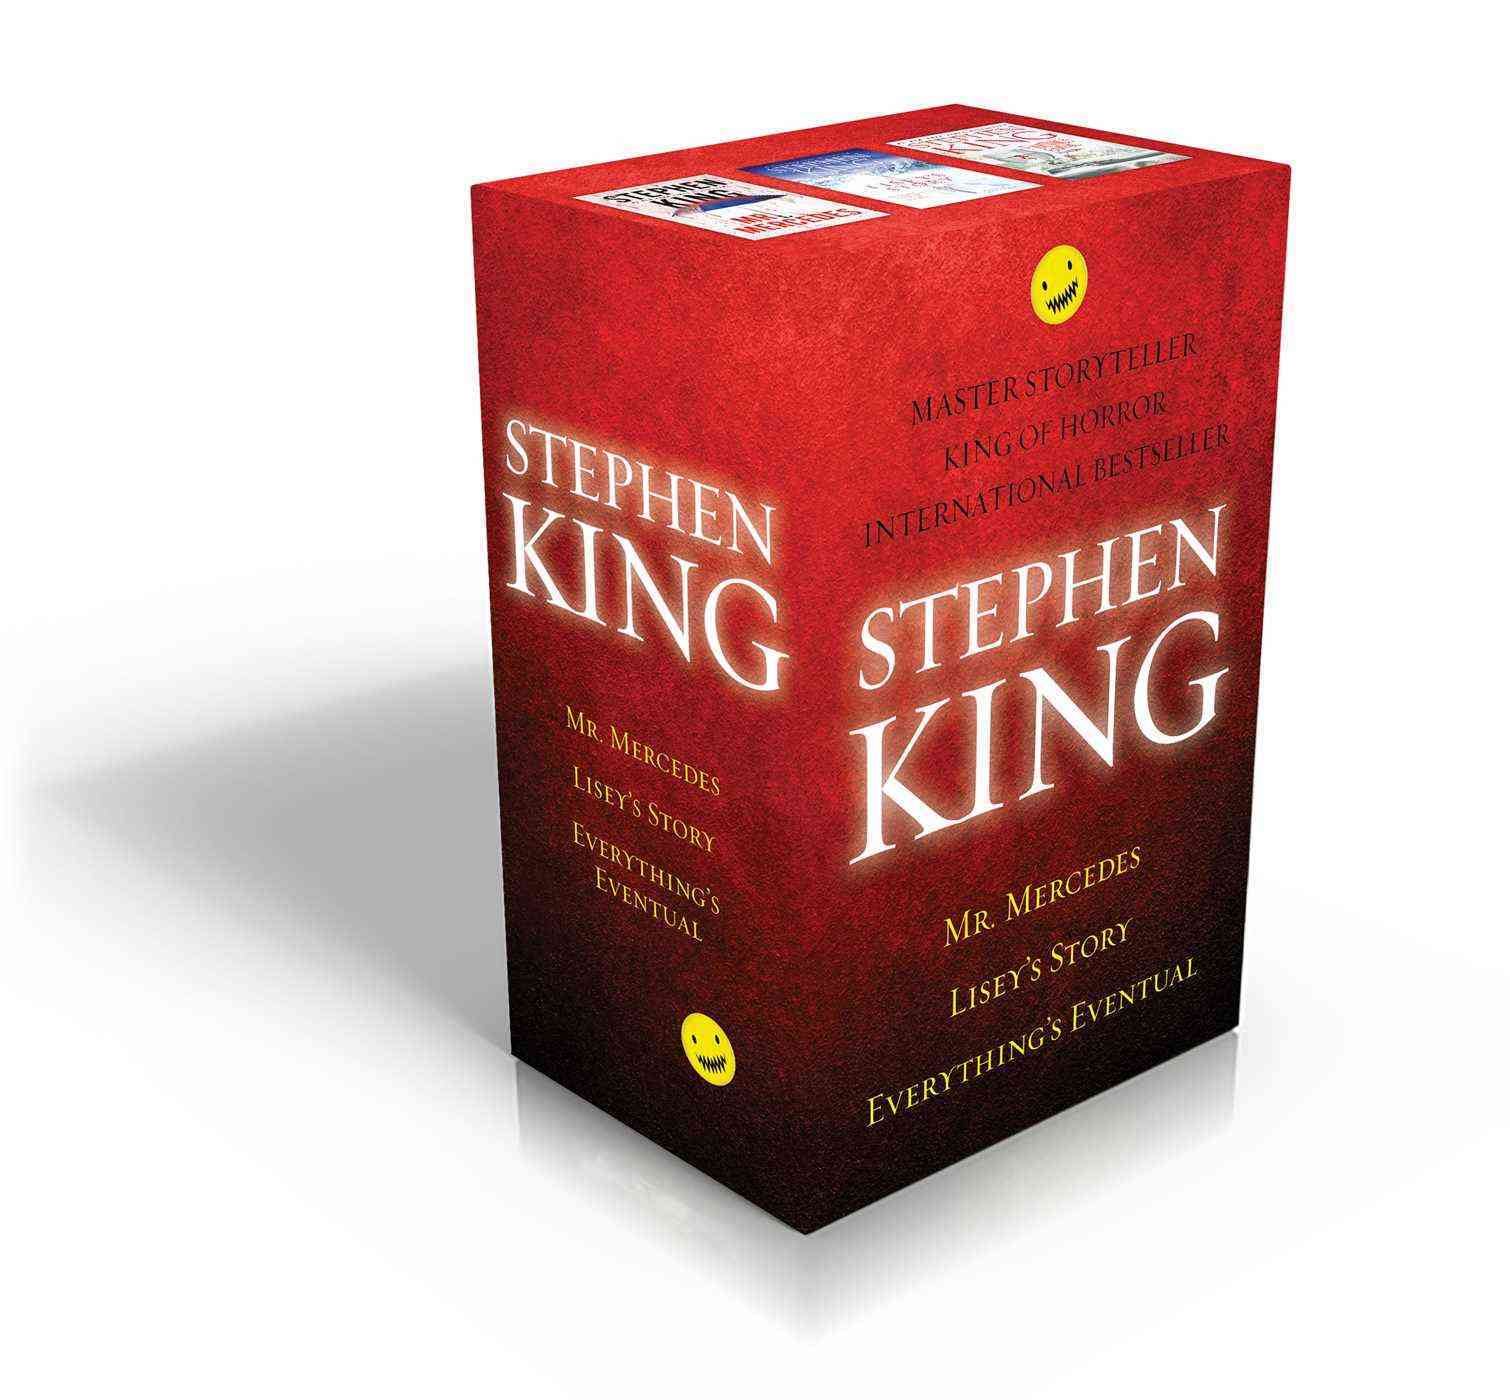 Stephen King - Stephen King Box Set - Mr. Mercedes / Everything's Eventual / Lisey's Story